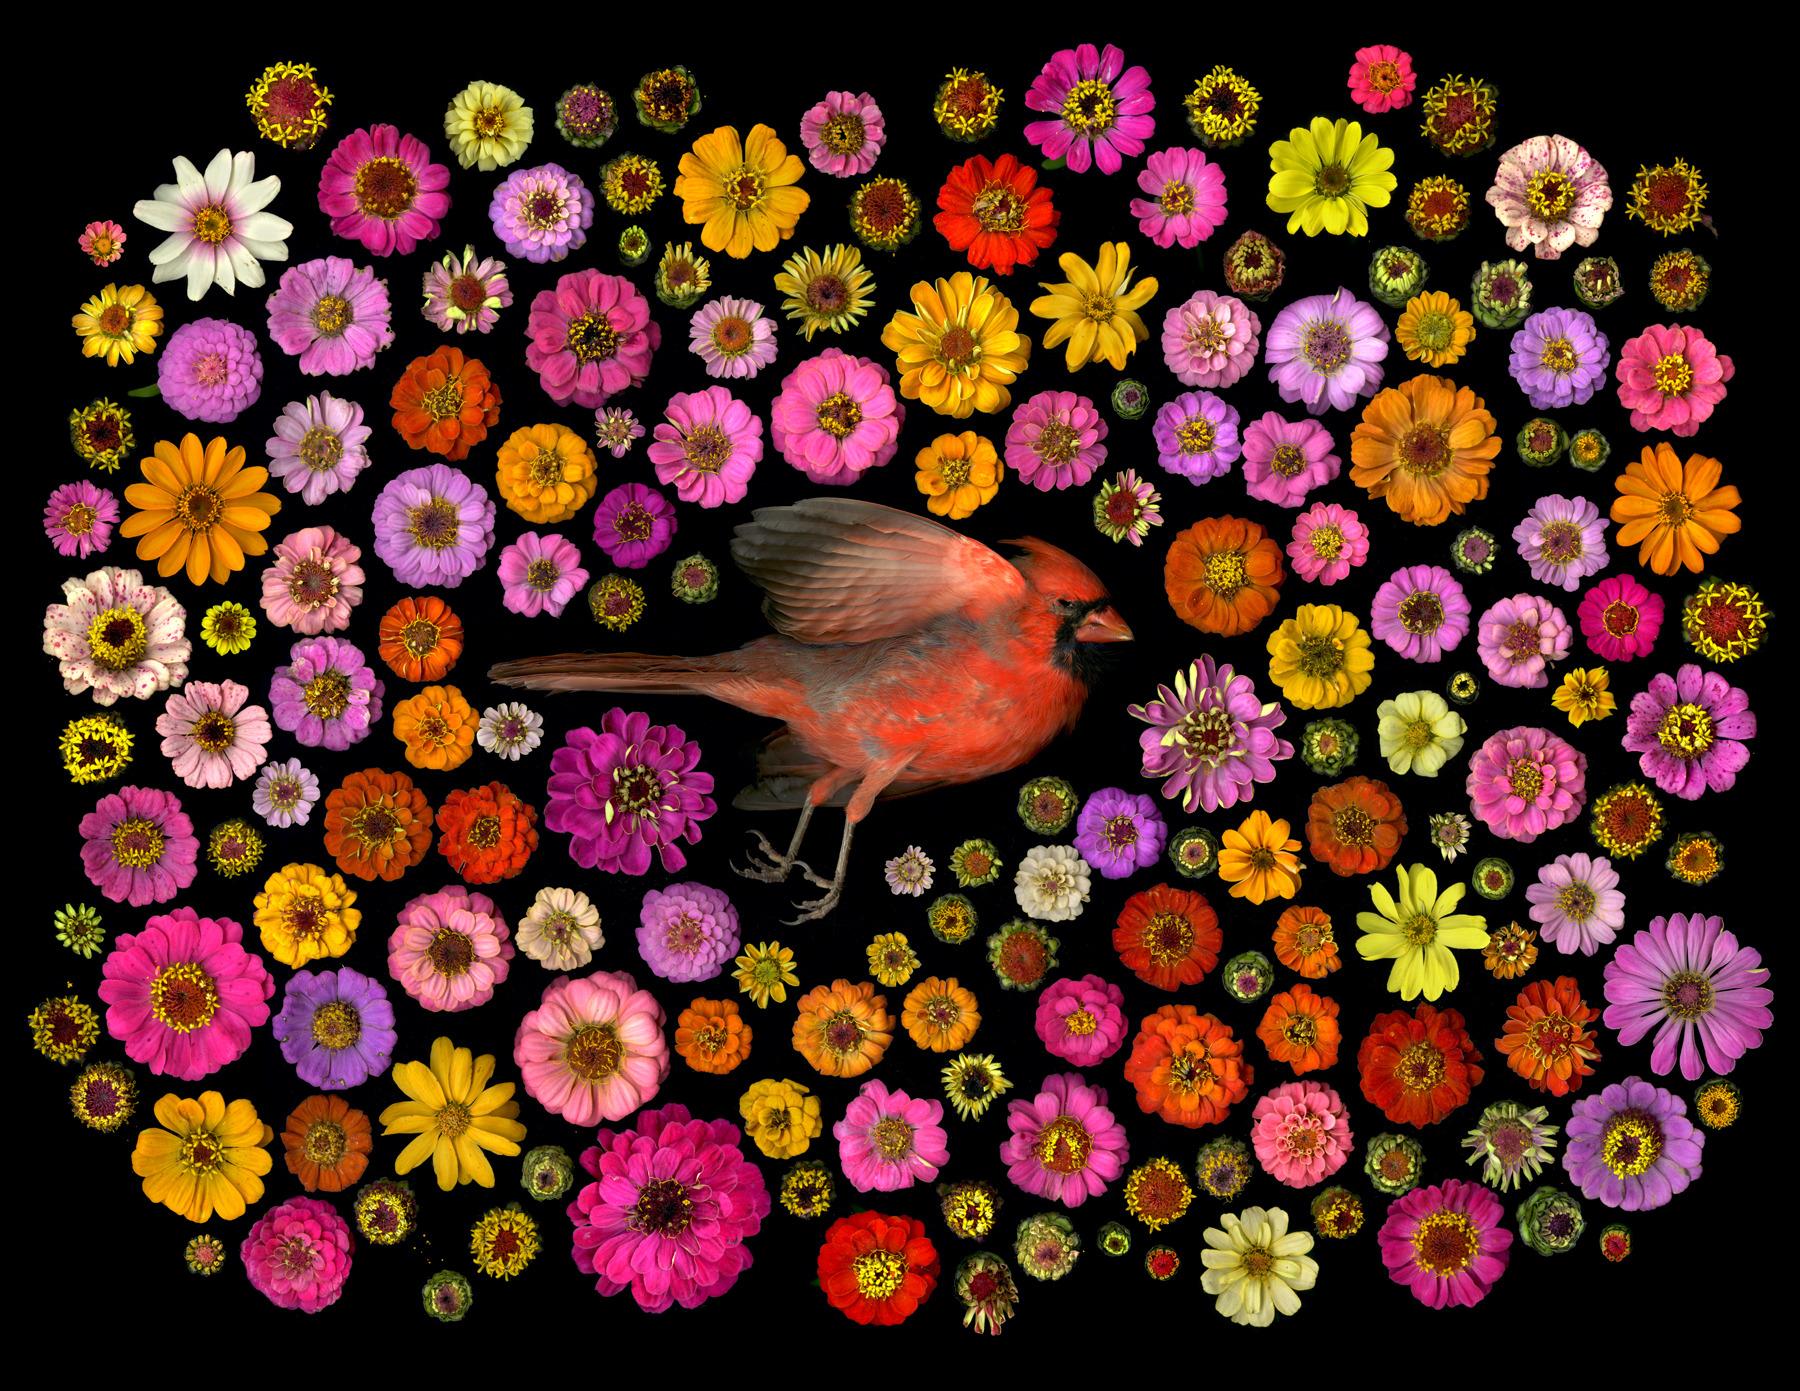 """Memento Mori Mandalas"" by Portia Munson"